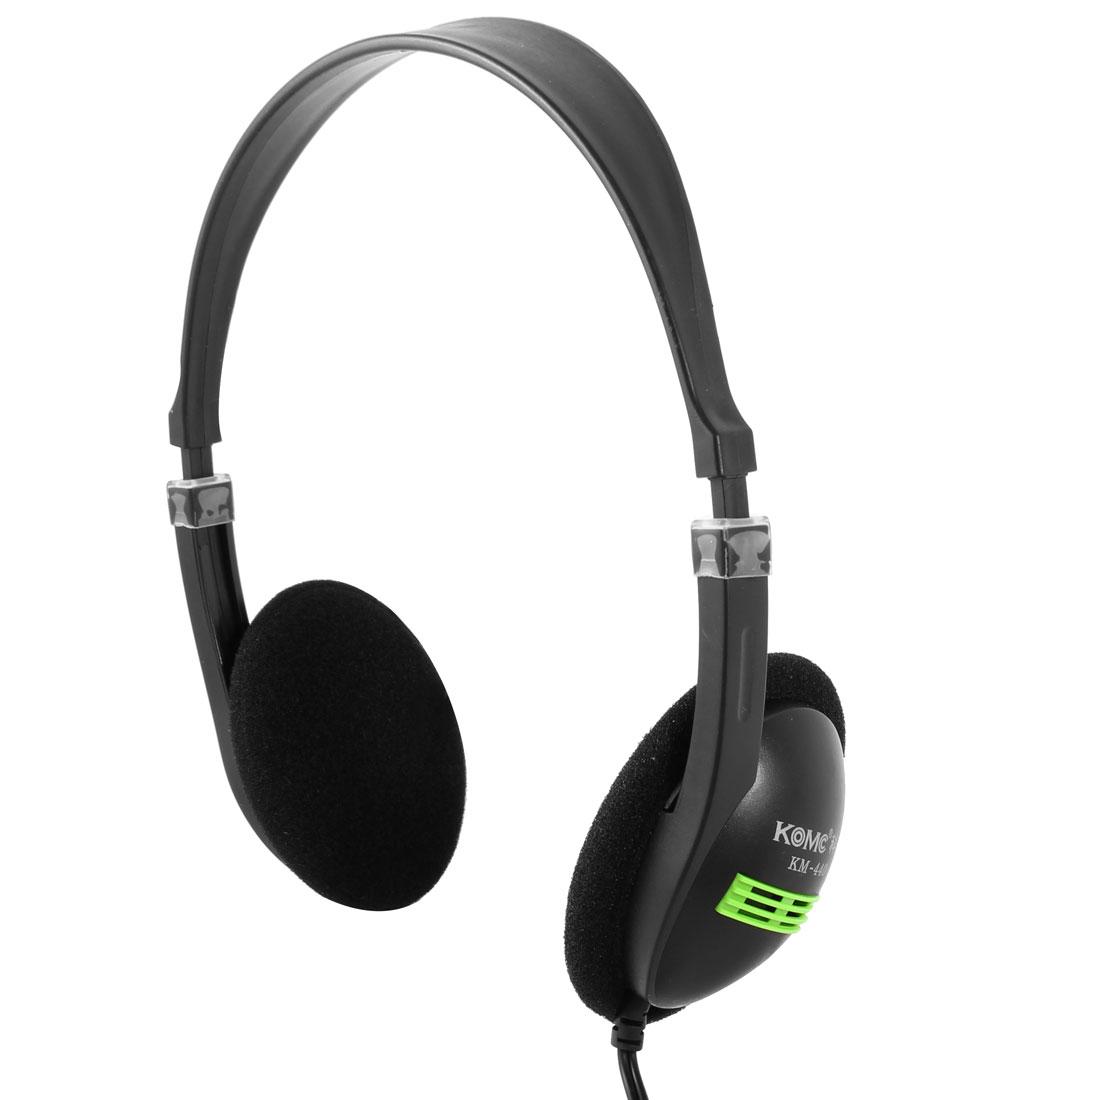 PC Computer 5.7ft Cable 3.5mm Plug Earphone Headphone Headset w Microphone